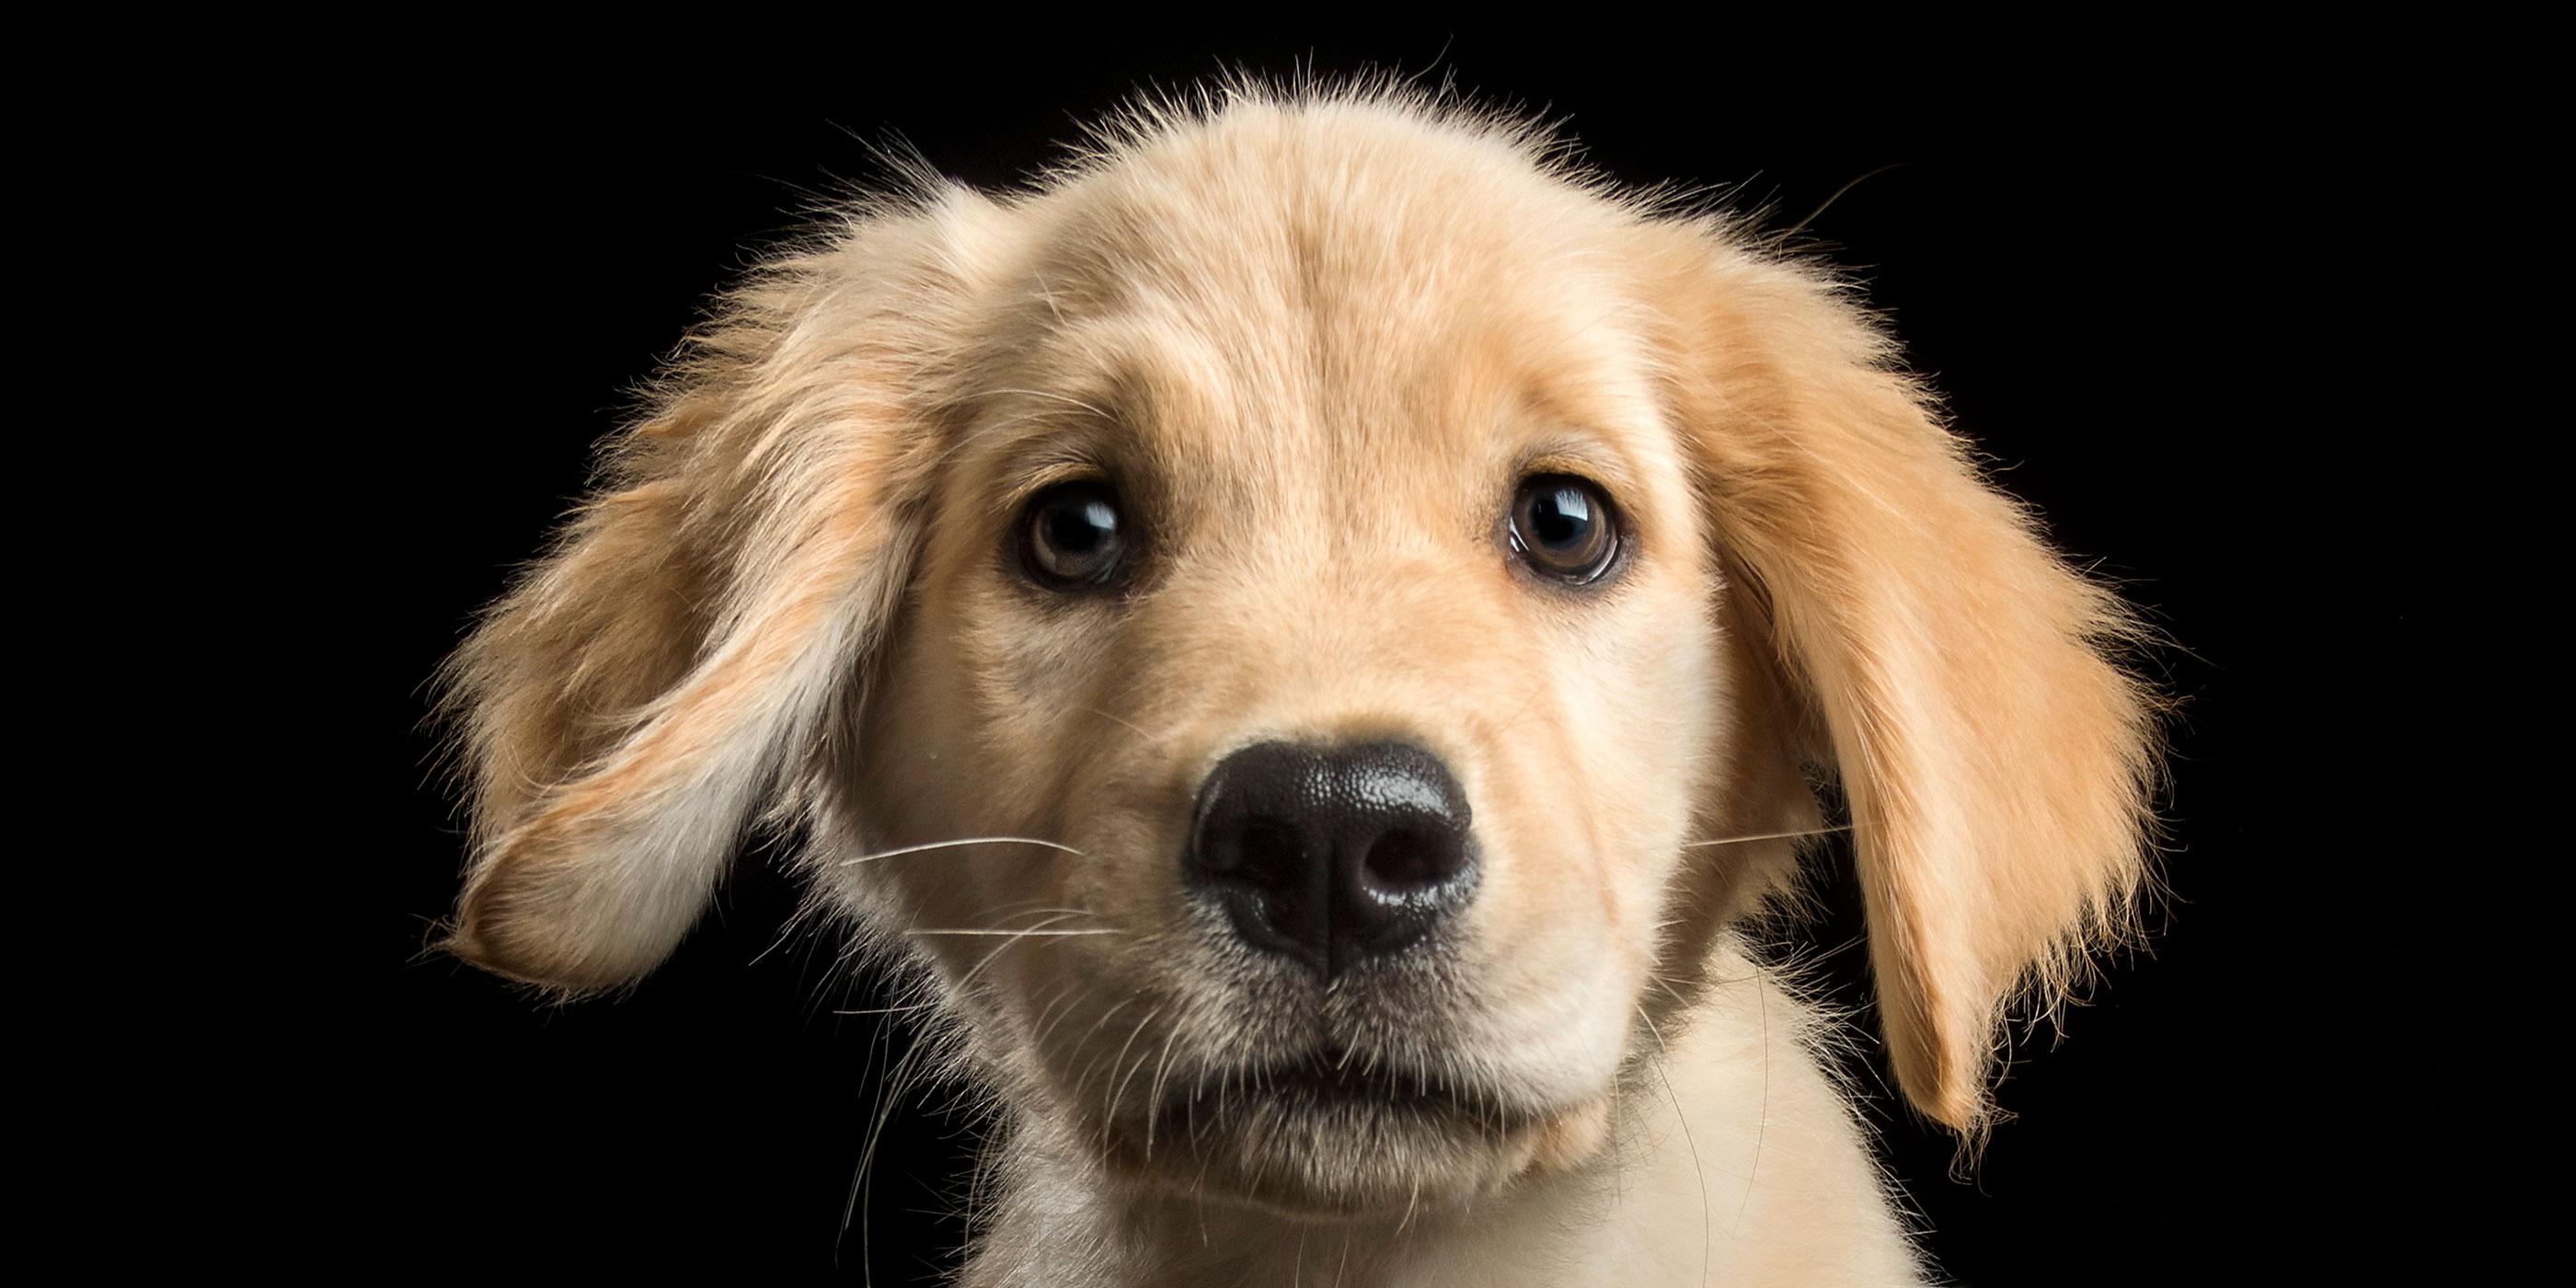 floppy eared golden retriever puppy